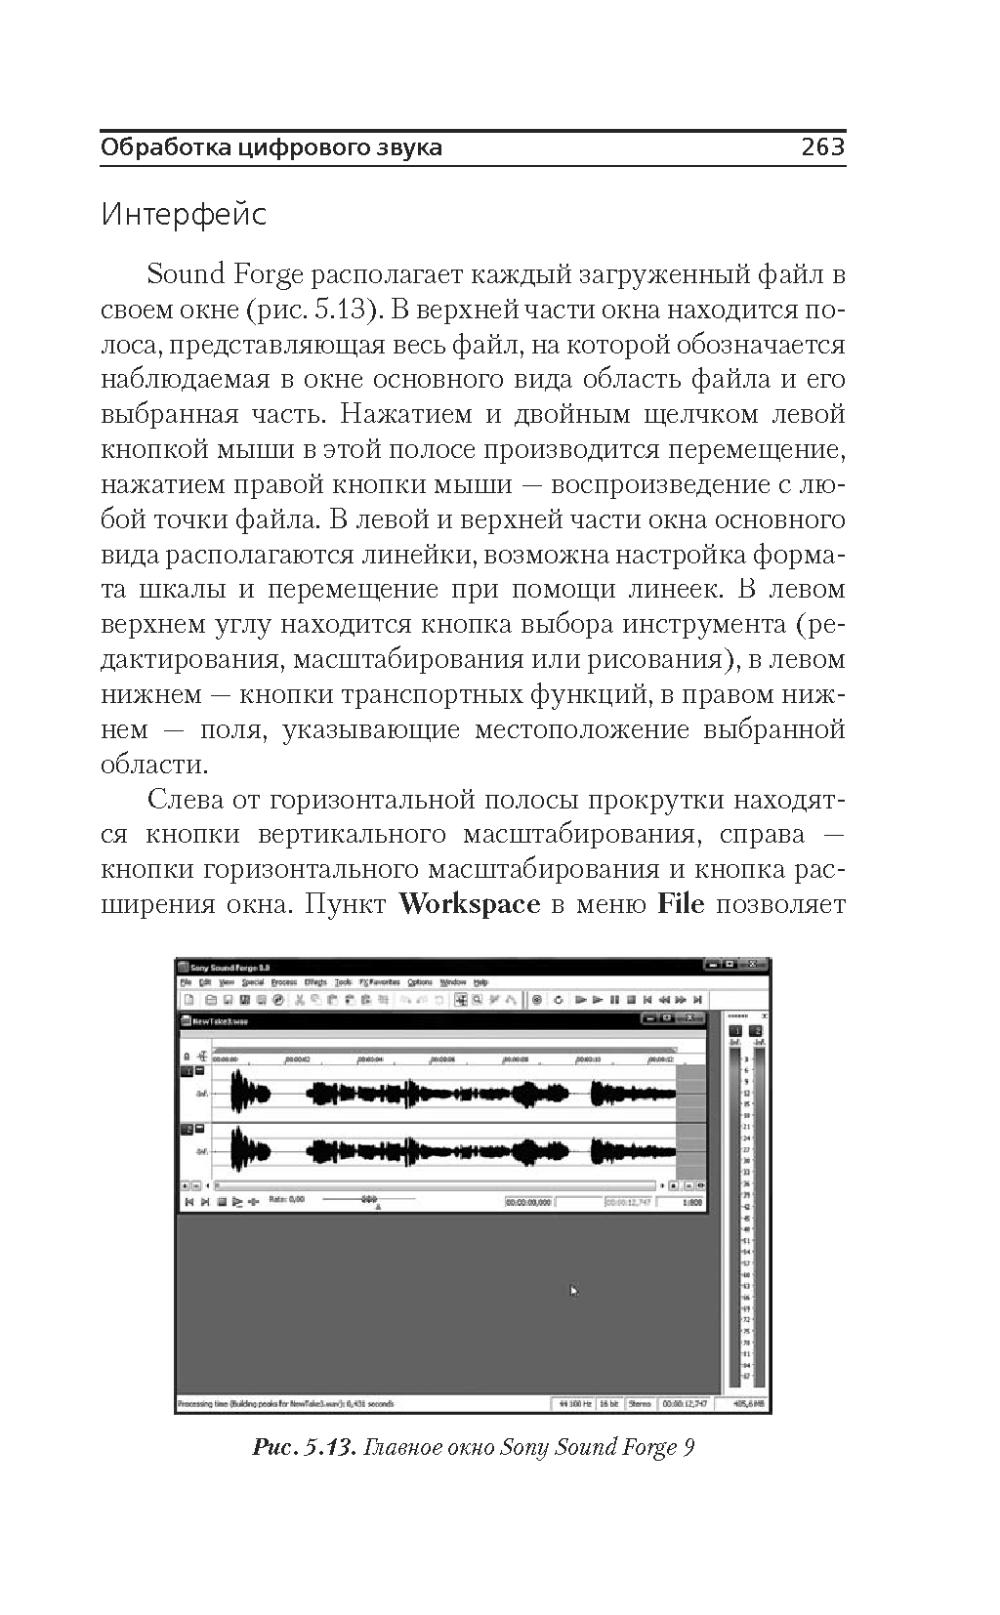 http://i6.imageban.ru/out/2013/12/13/7100881e5c1dd6a90e483c2527ac5599.jpg